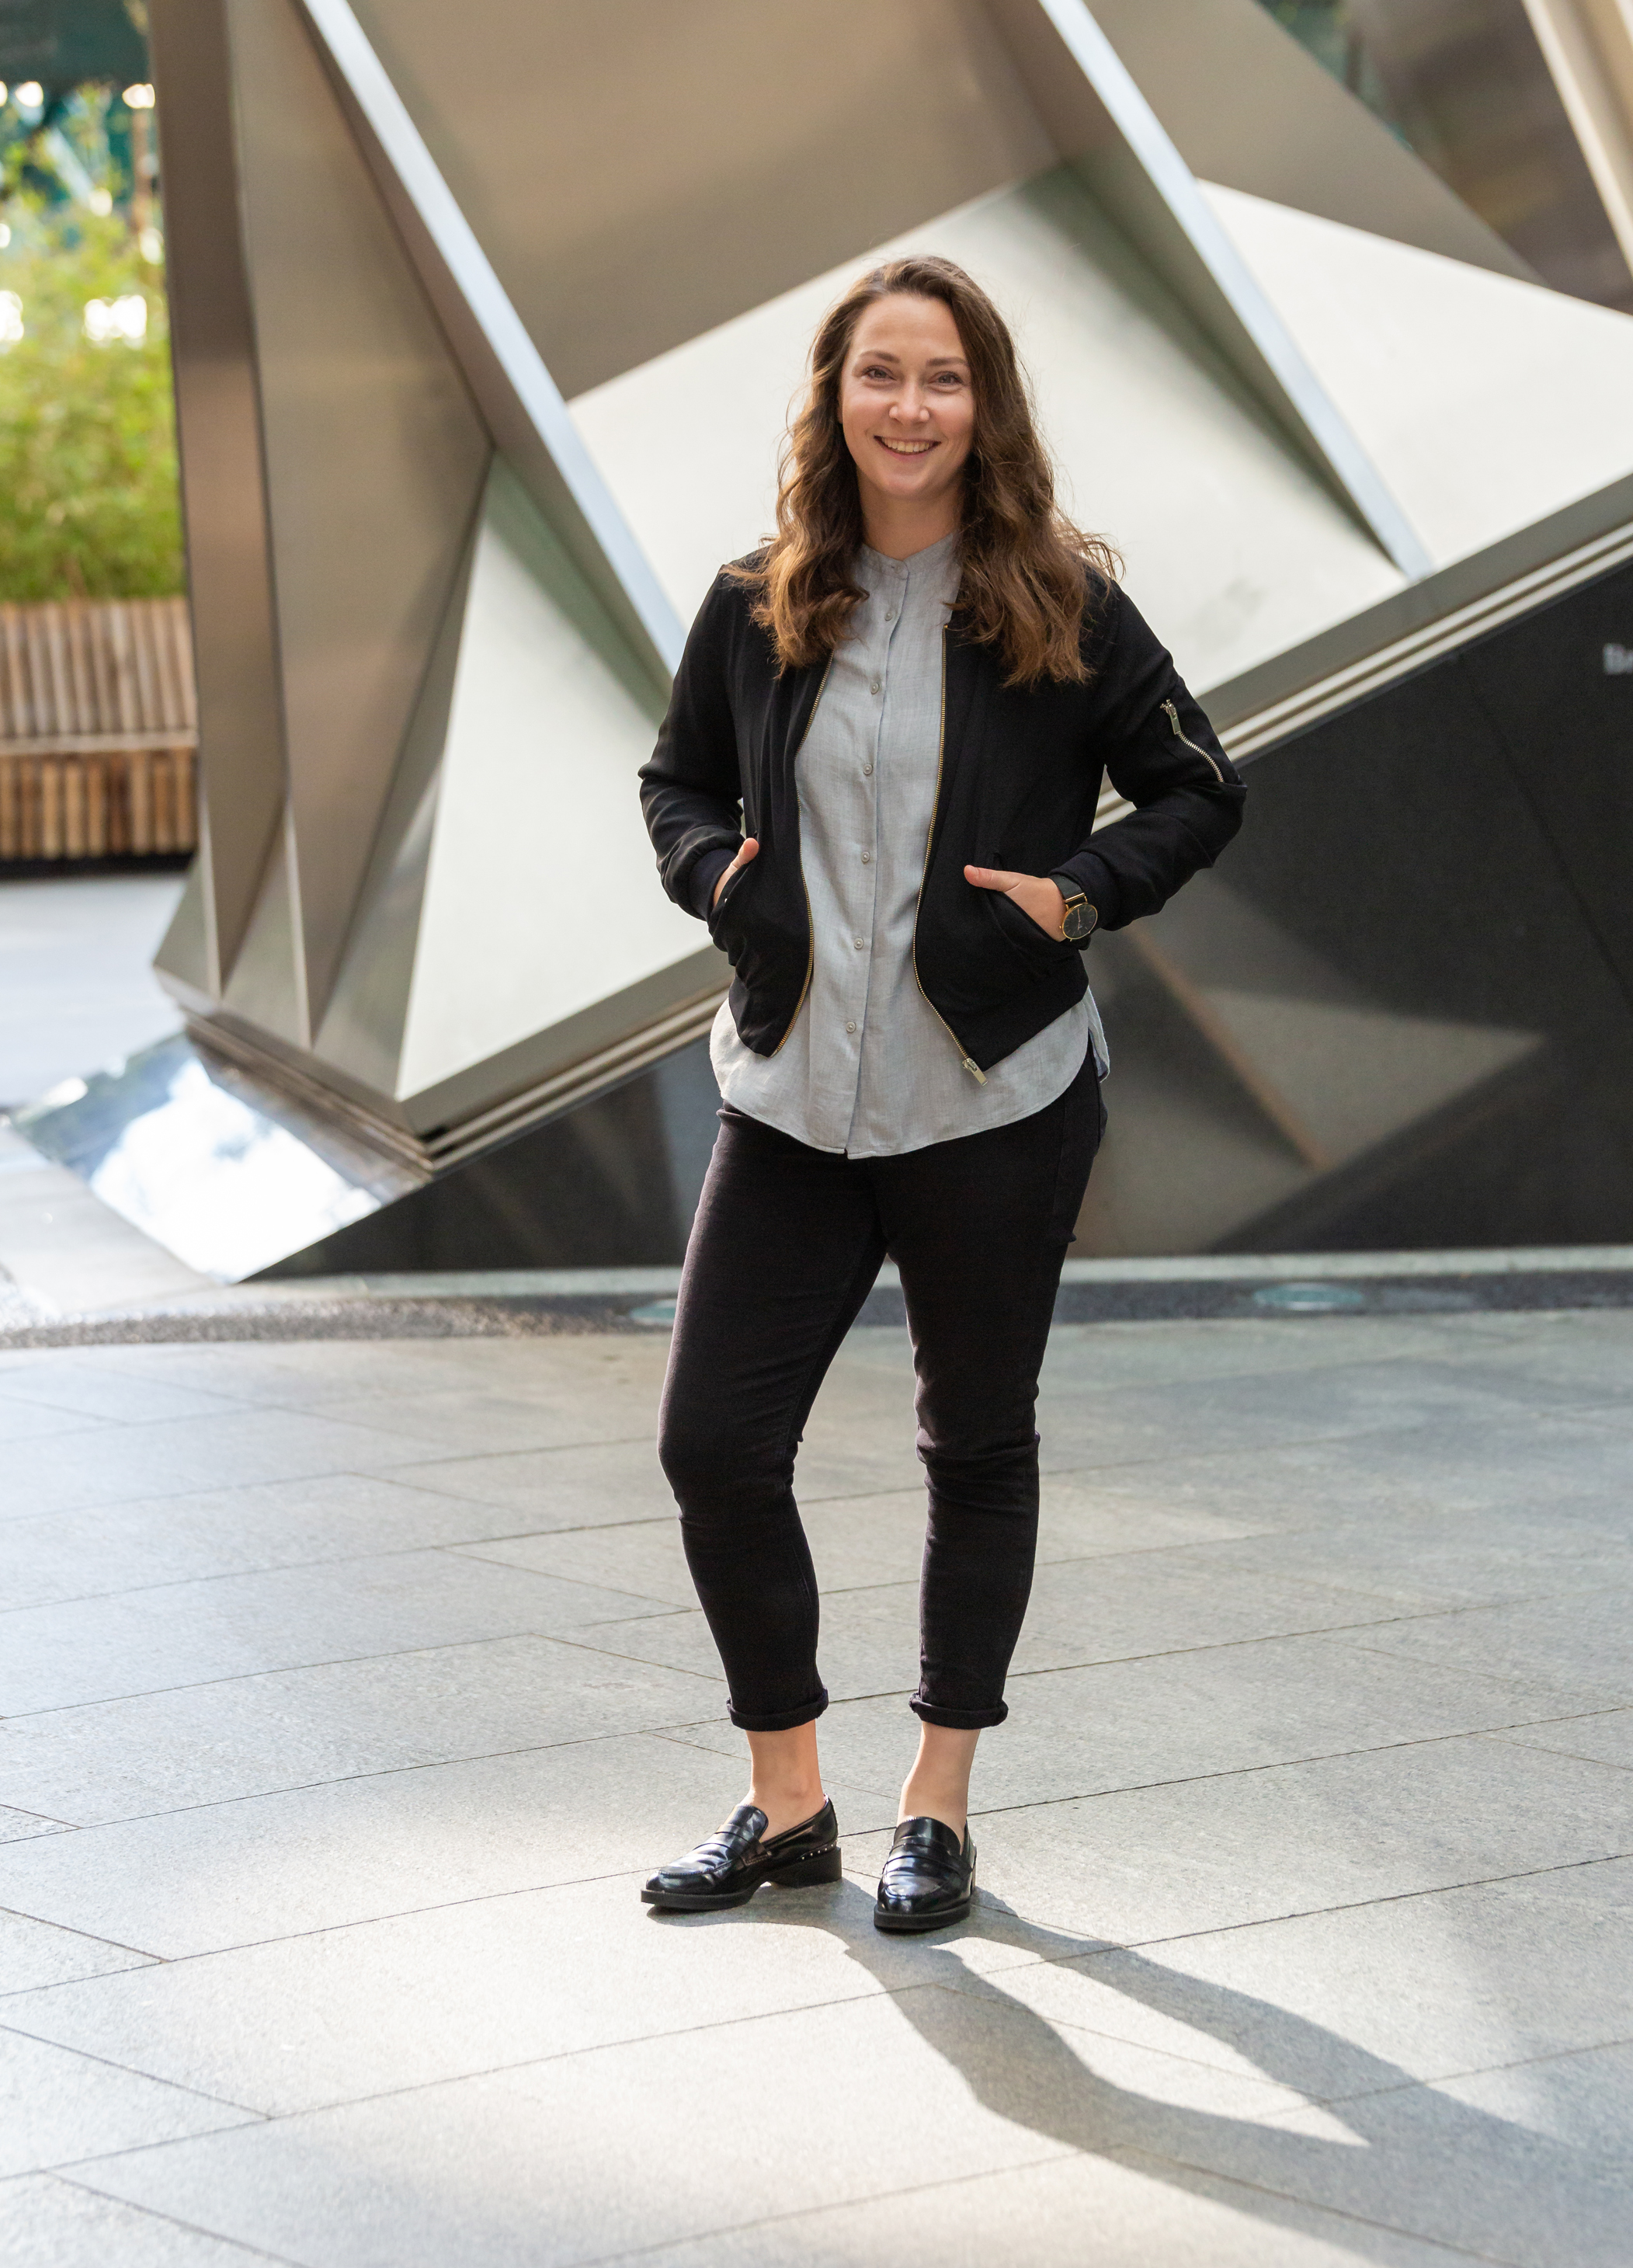 Lavinia Haane, Associate Director, Tyto PR